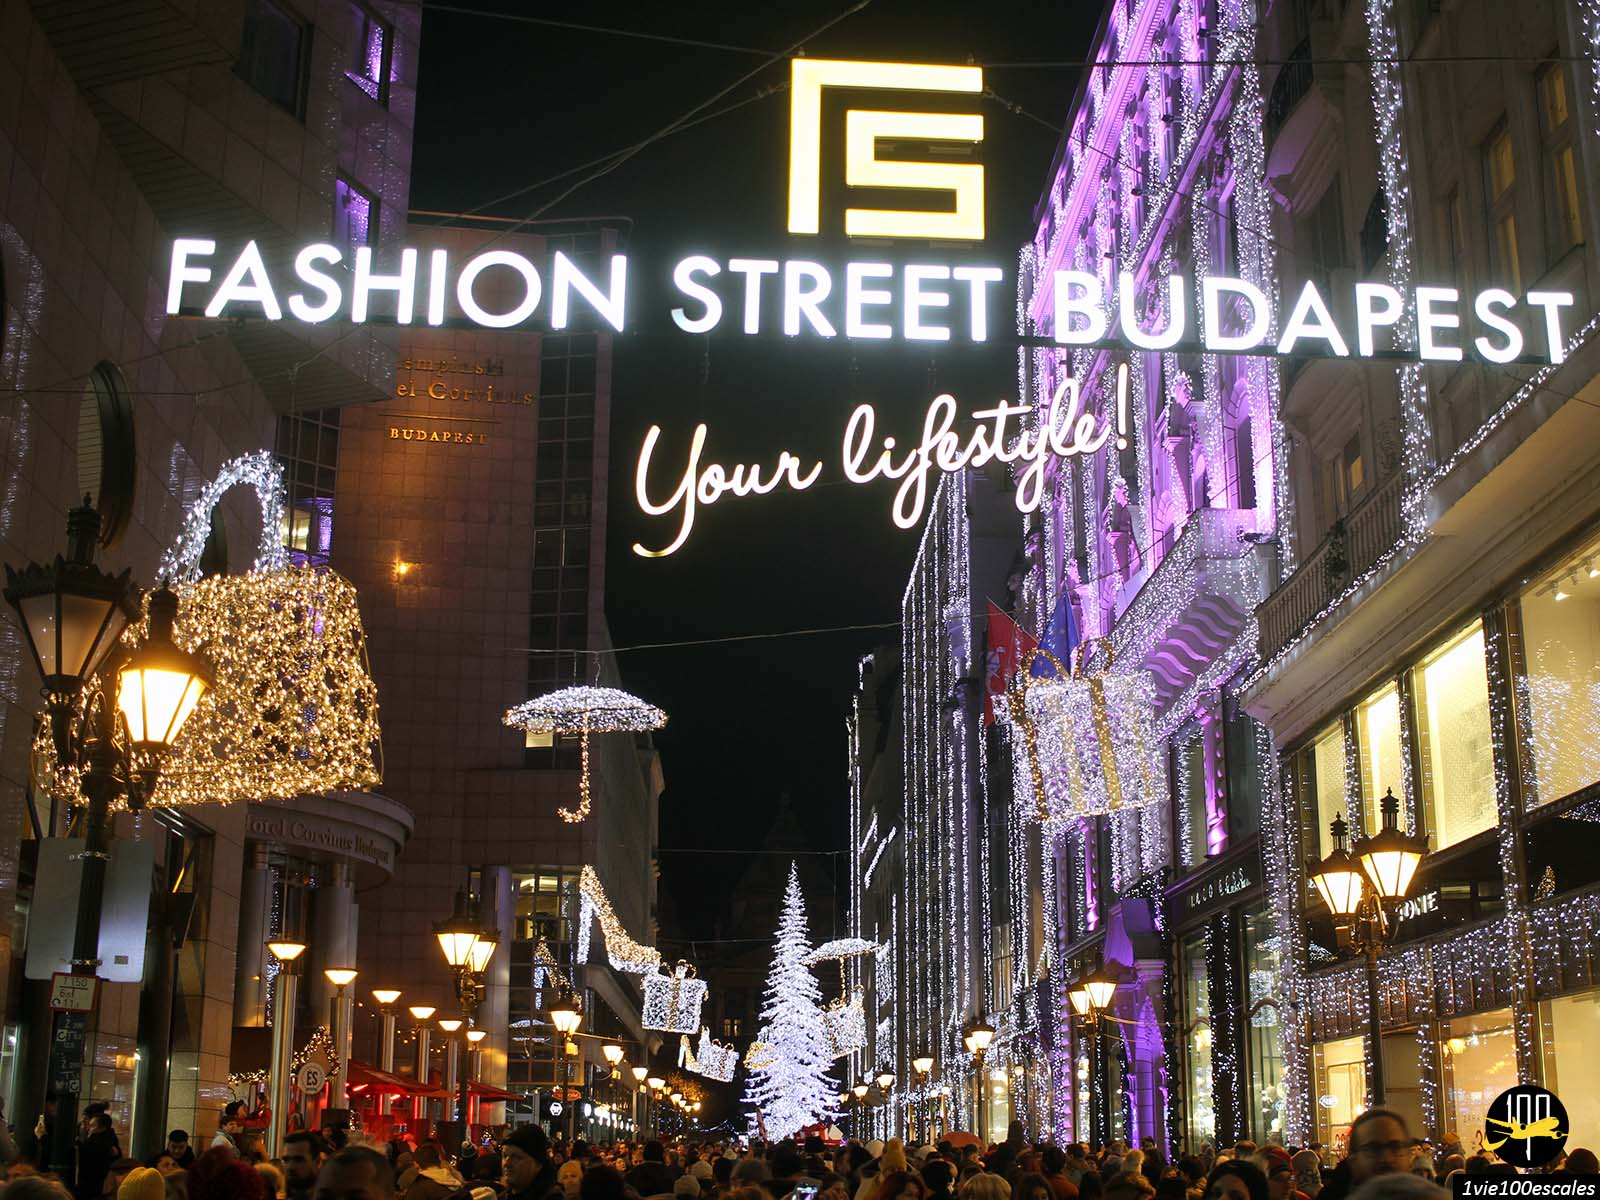 Les illuminations de noel de la Fashion street à Budapest